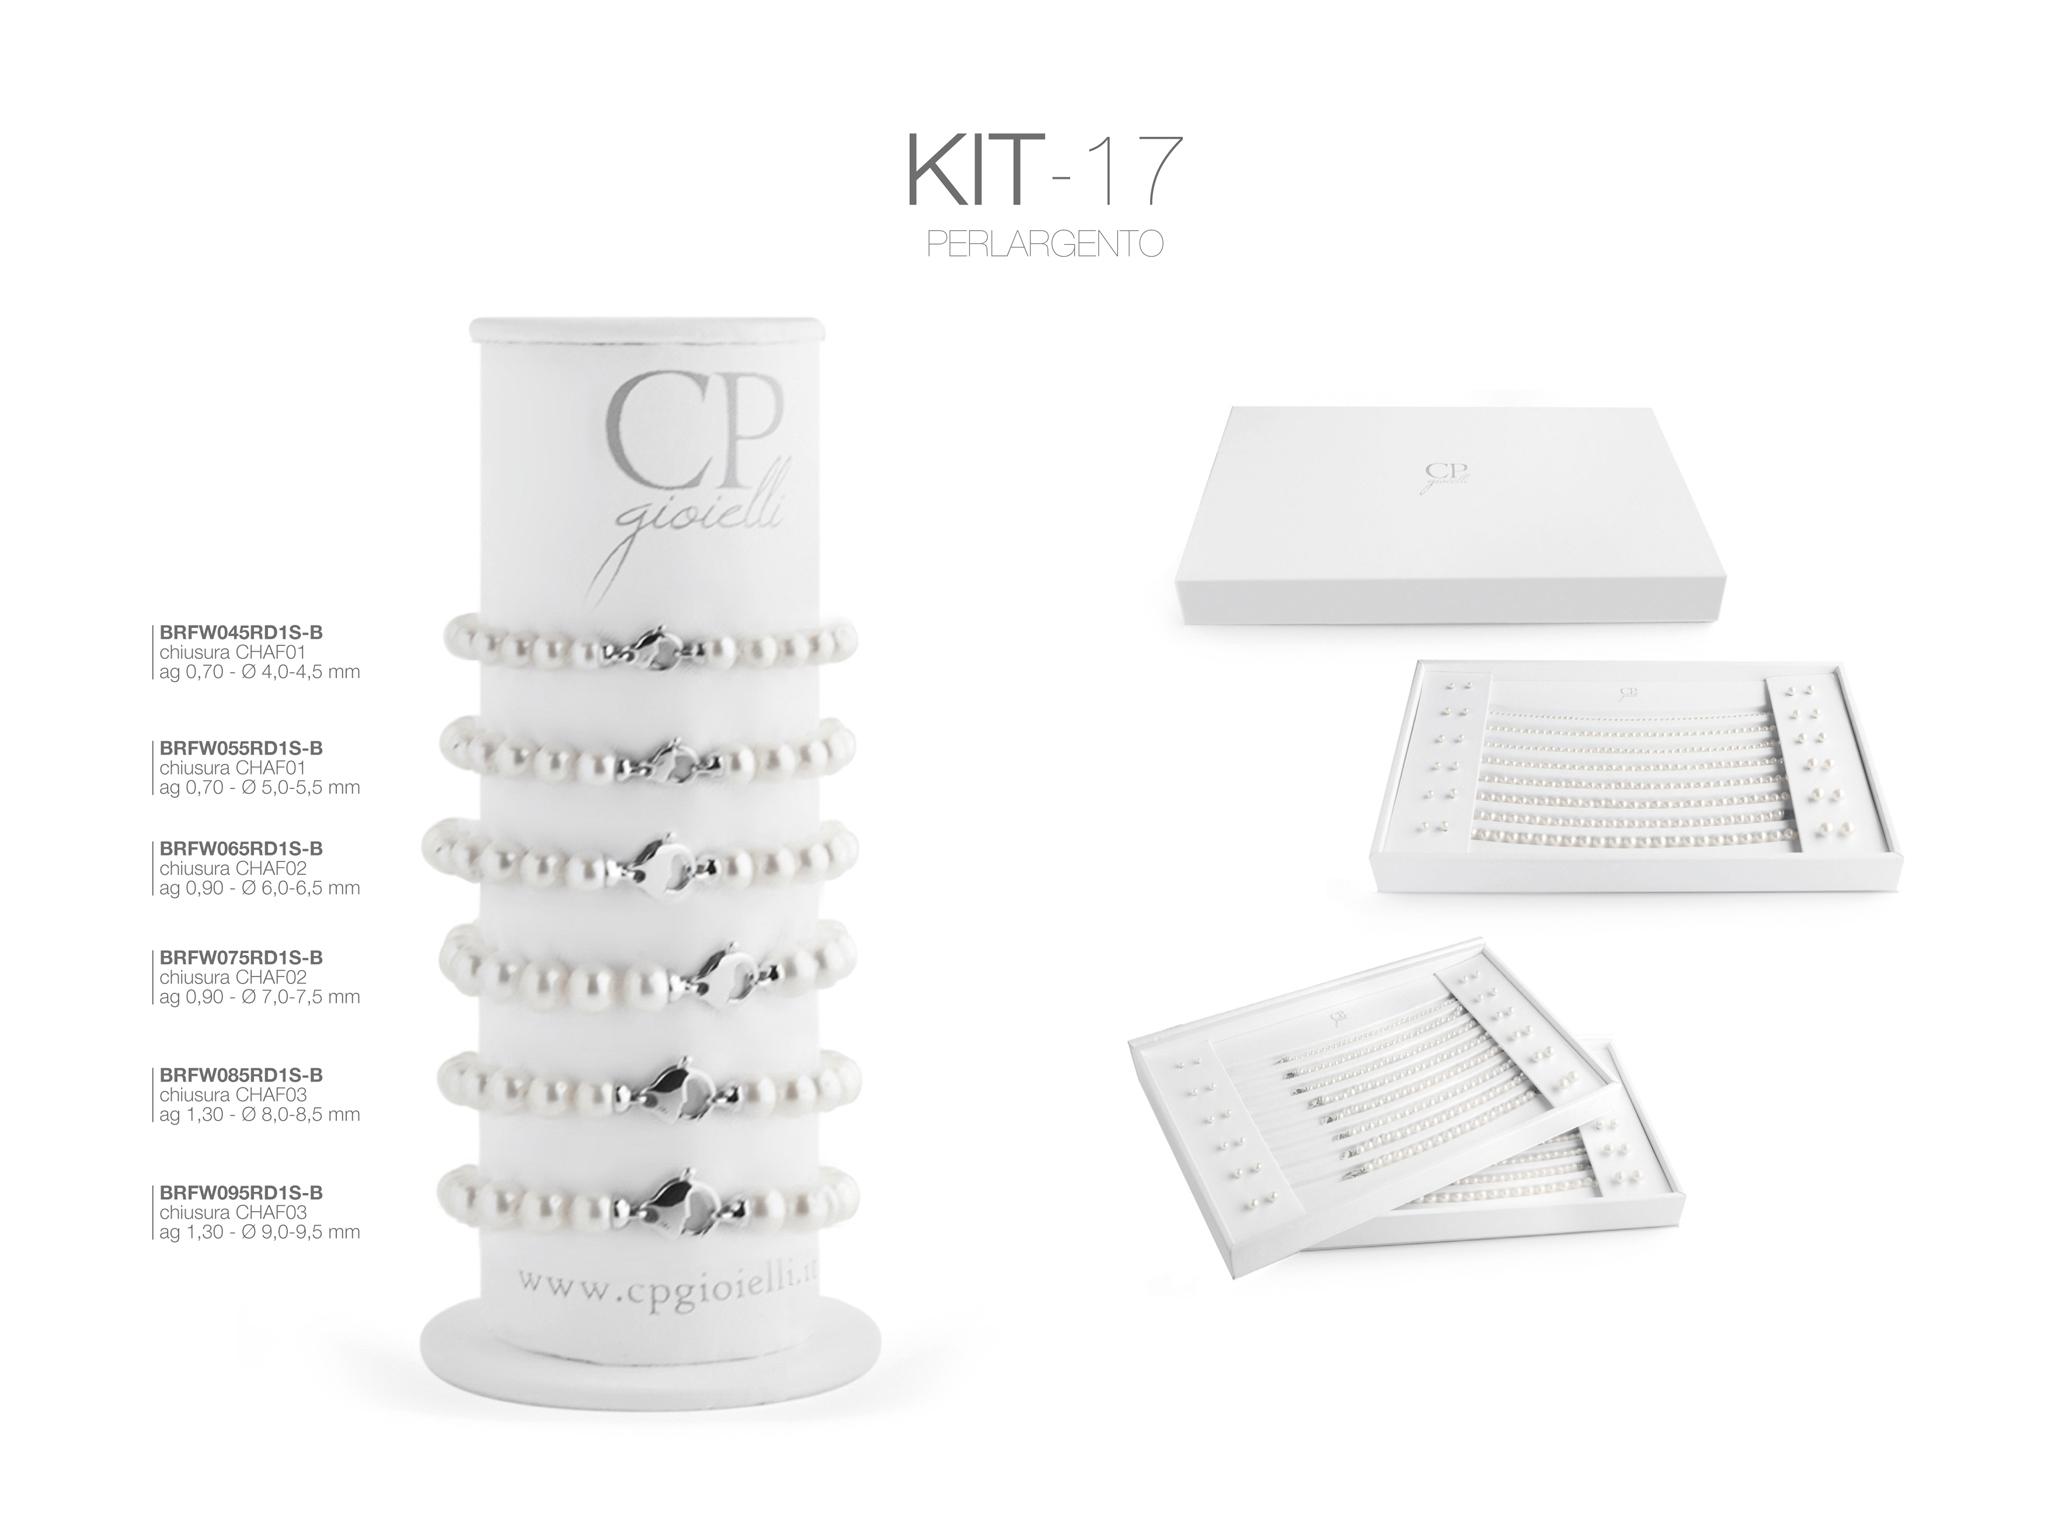 kit_argento_2-0_2016_pagina_54_app